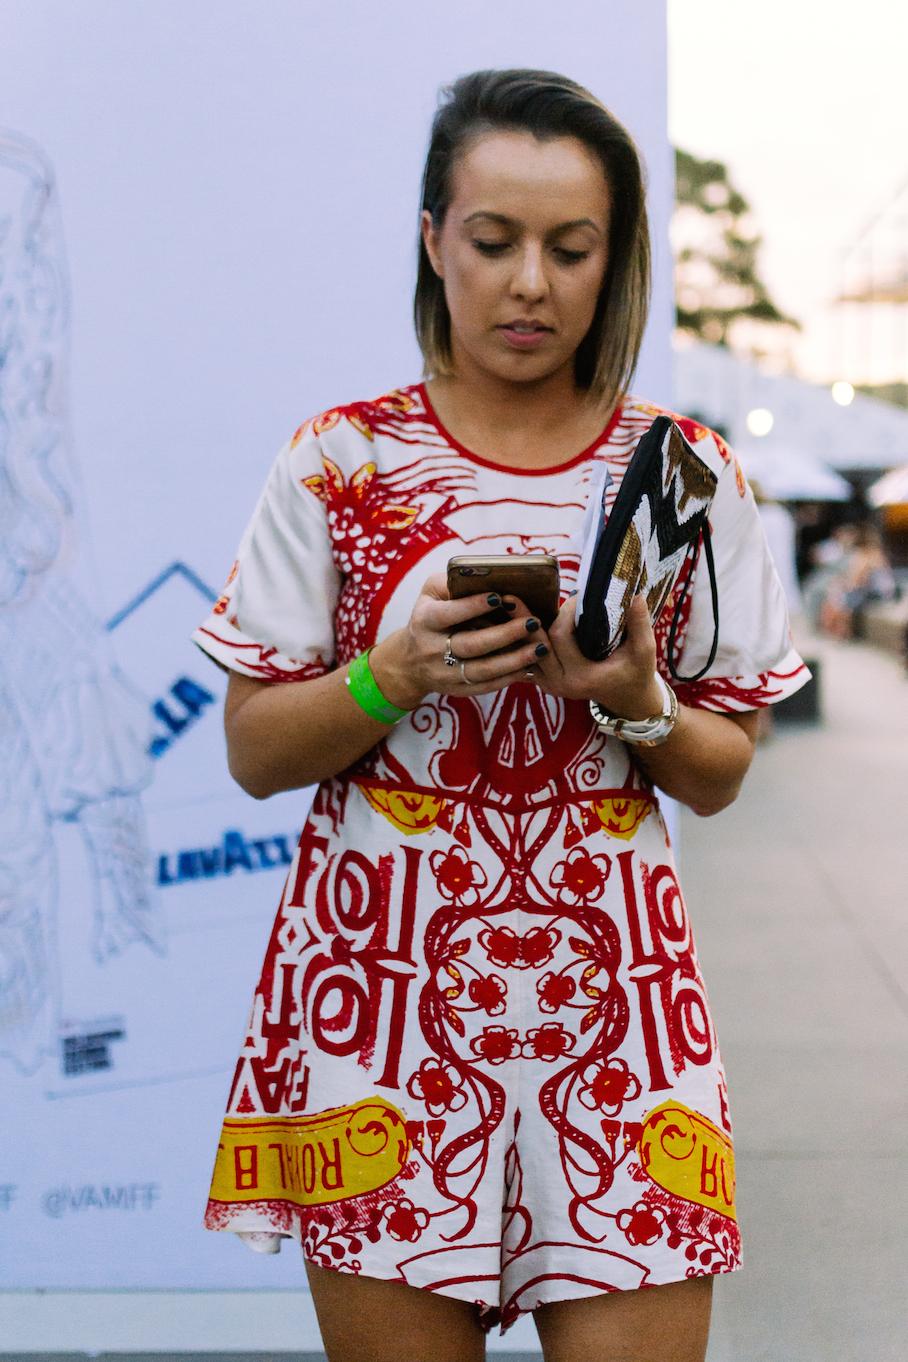 Vic: Alyssa Simpson, Food & Wine Instagrammer, at Melbourne's Fashion Festival.